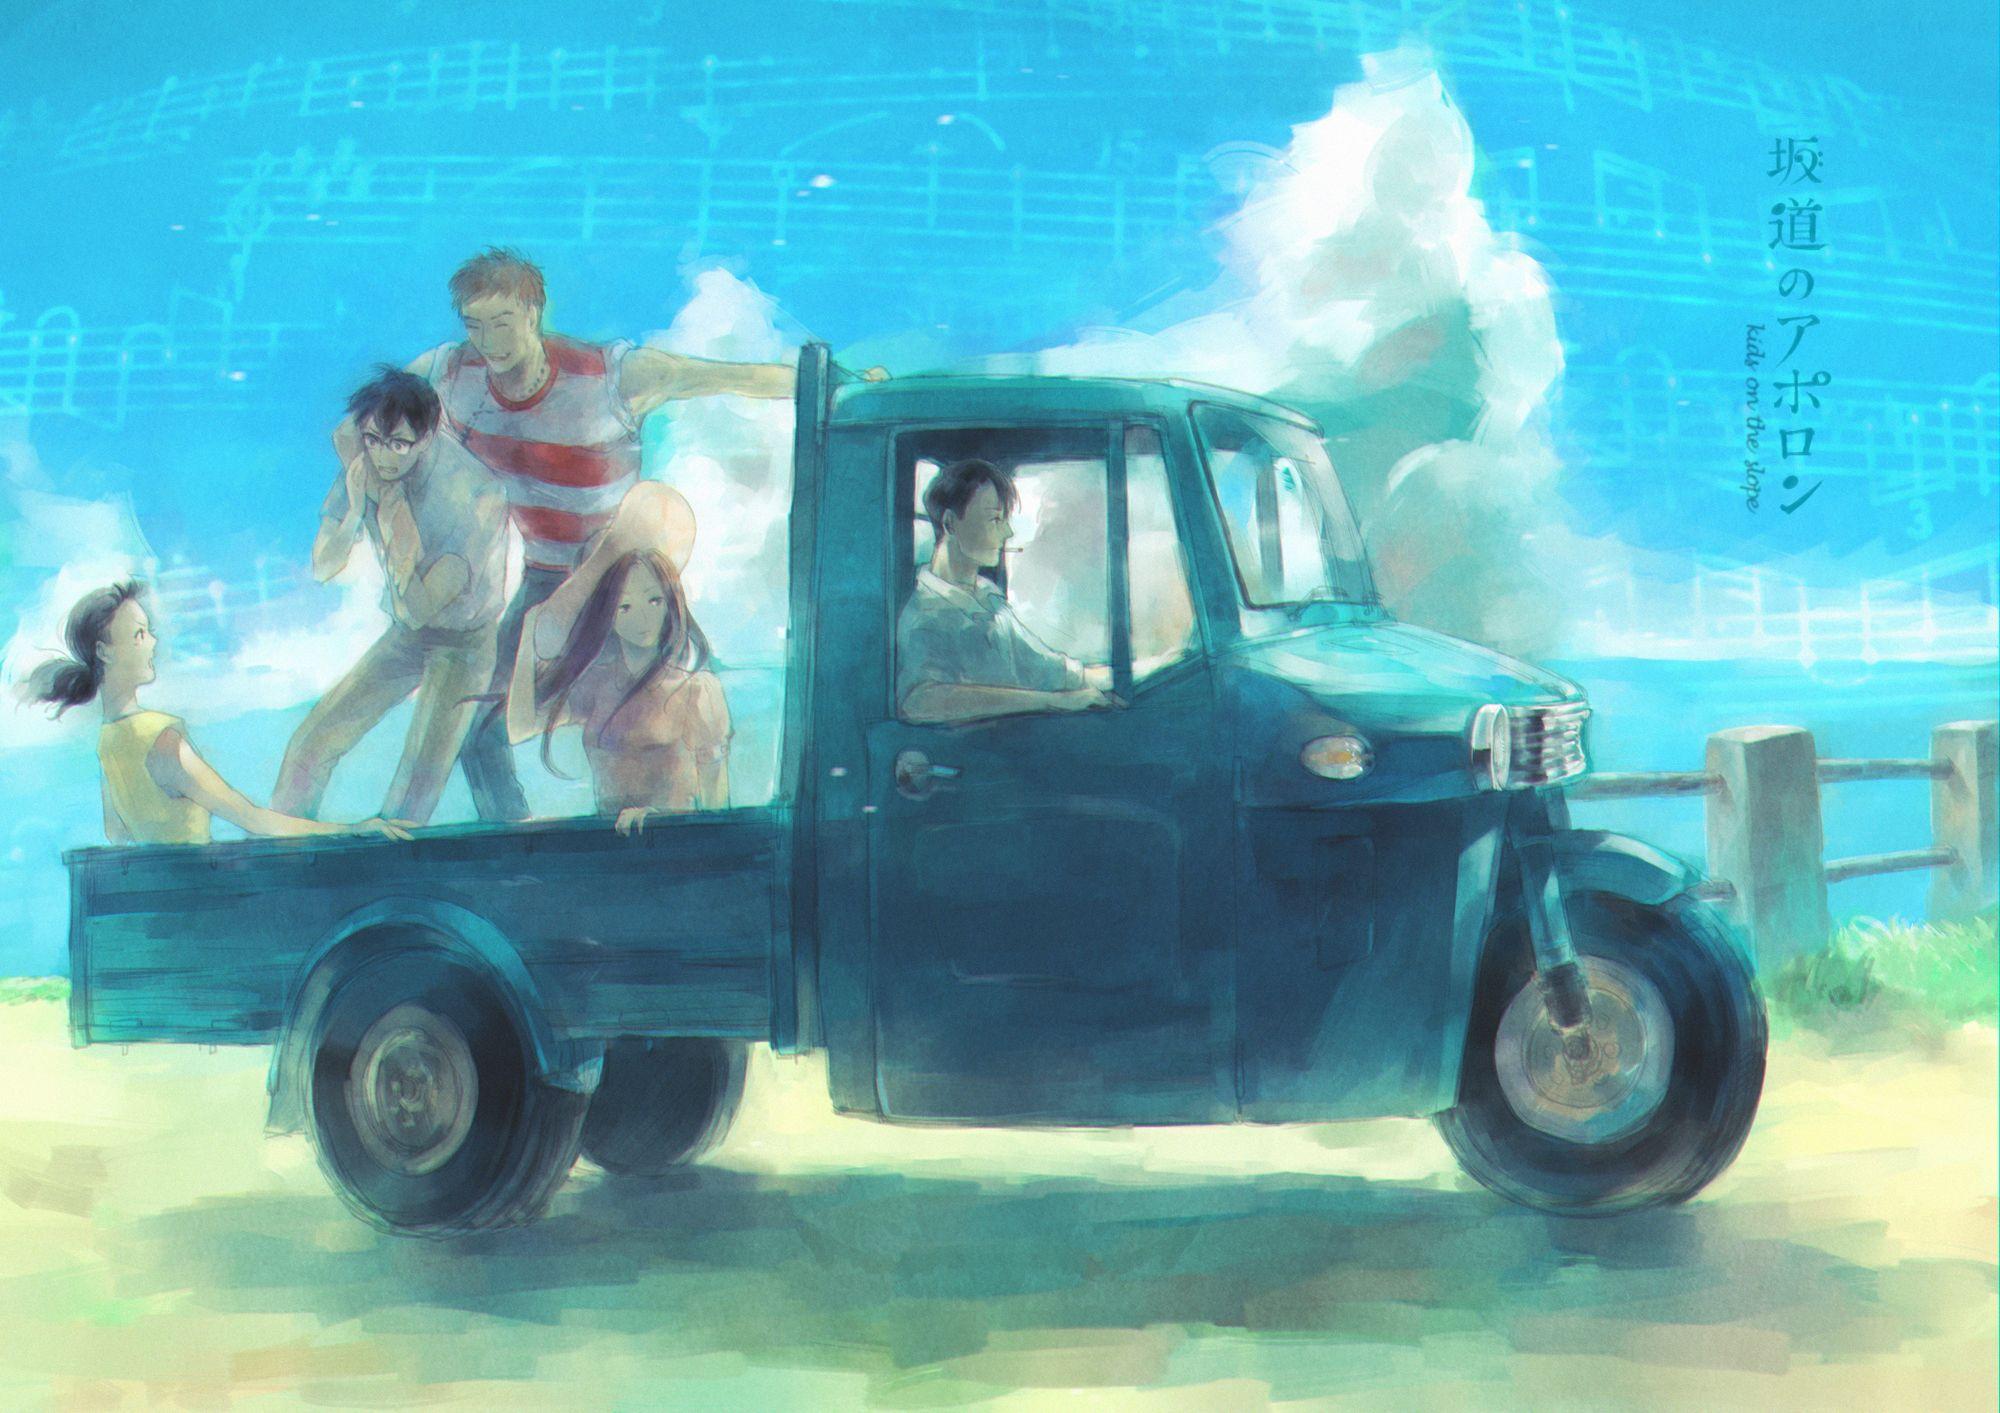 Lullaby Of Birdland Sakamichi No Apollon Anime Anime Images